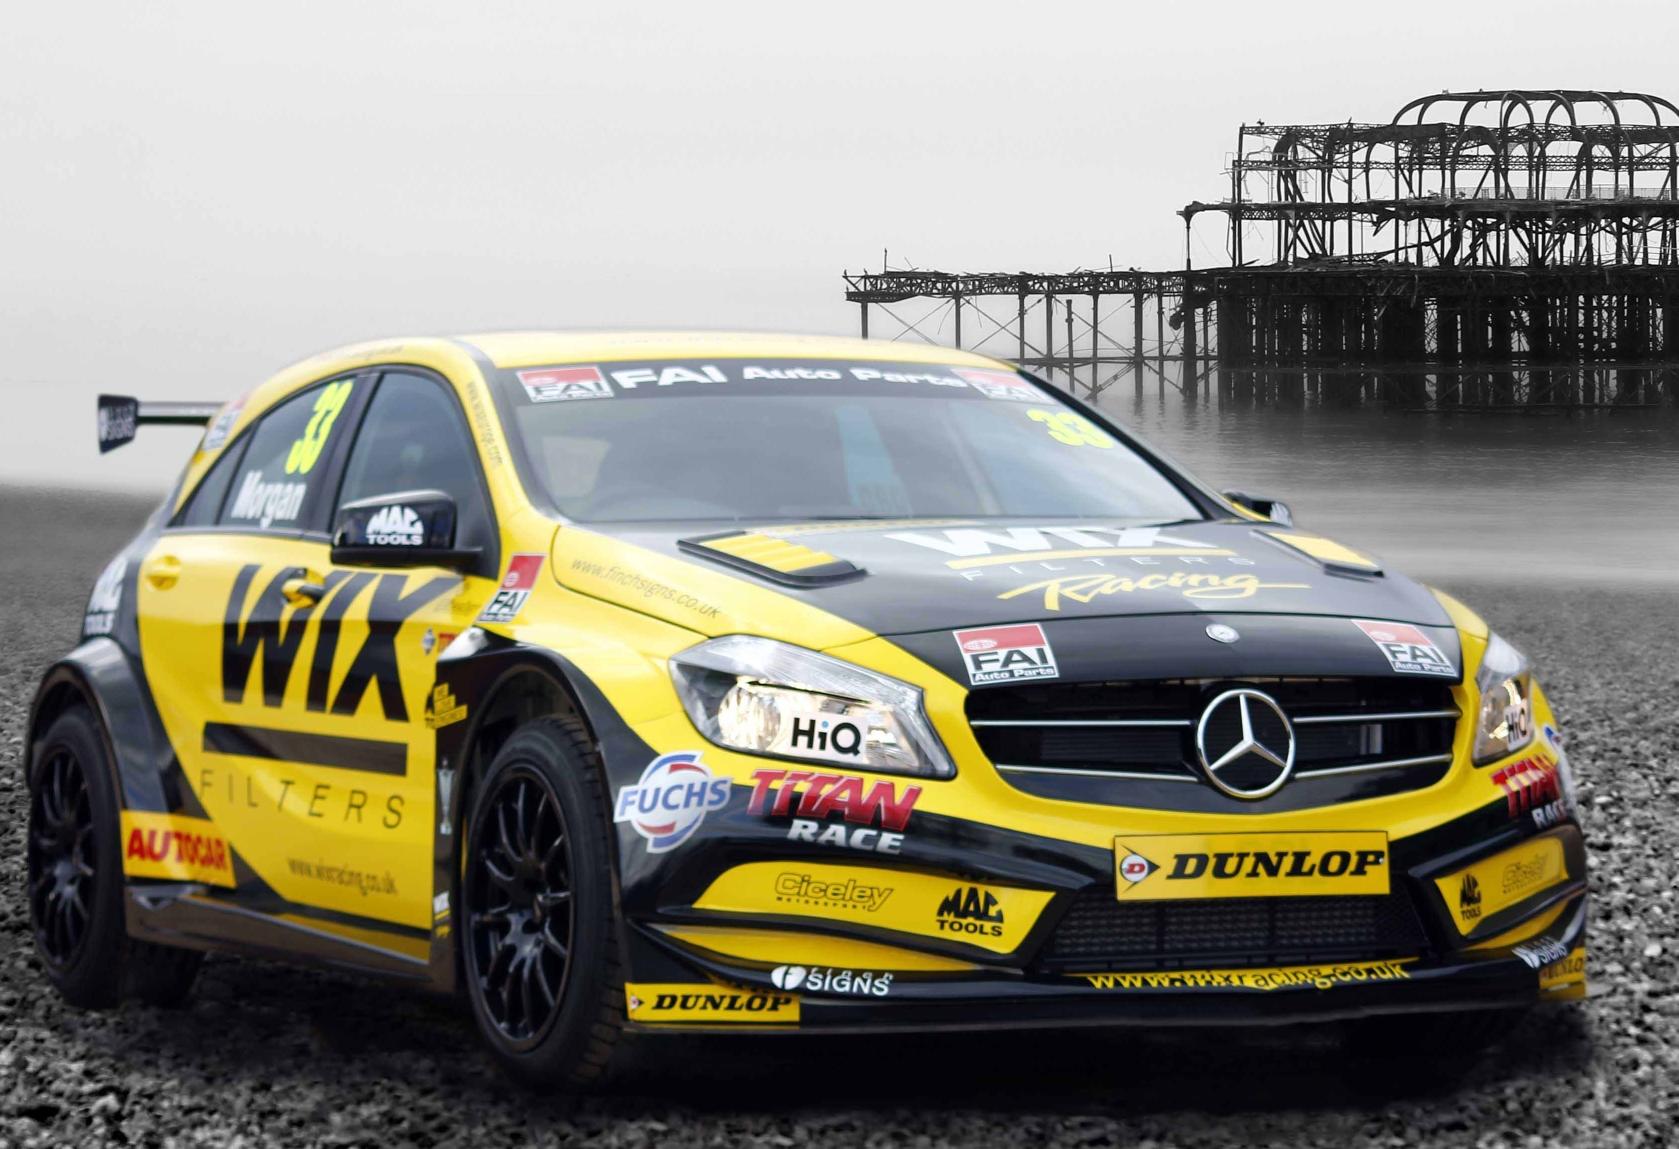 New Wix 2014 Btcc Race Livery Goes On Show Garagewire